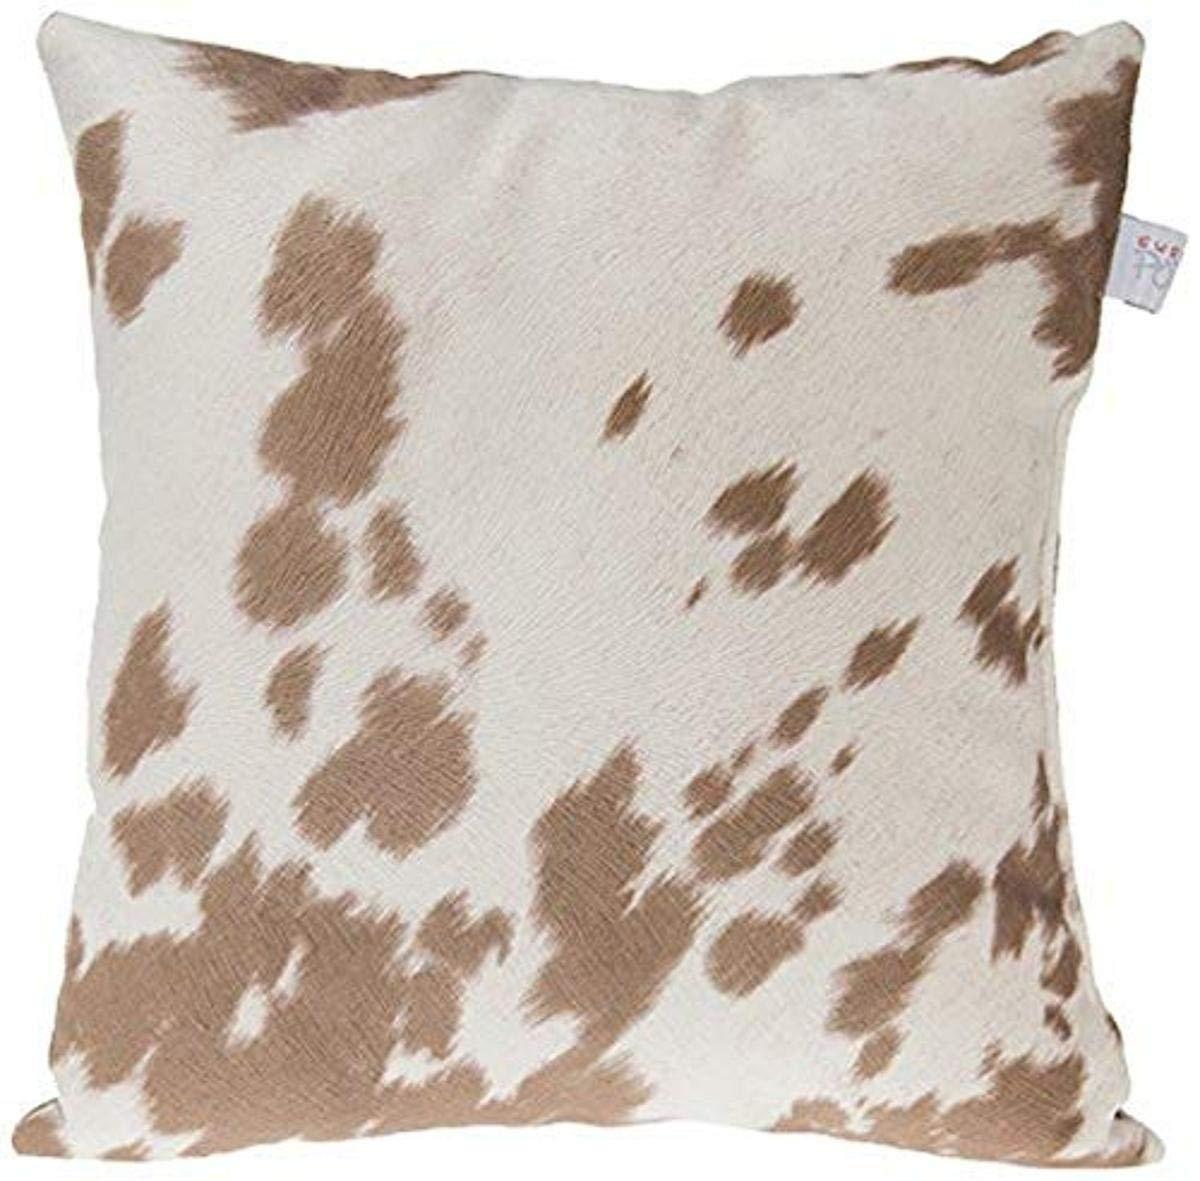 Sweet Potato Happy Trails Pillow, Cow